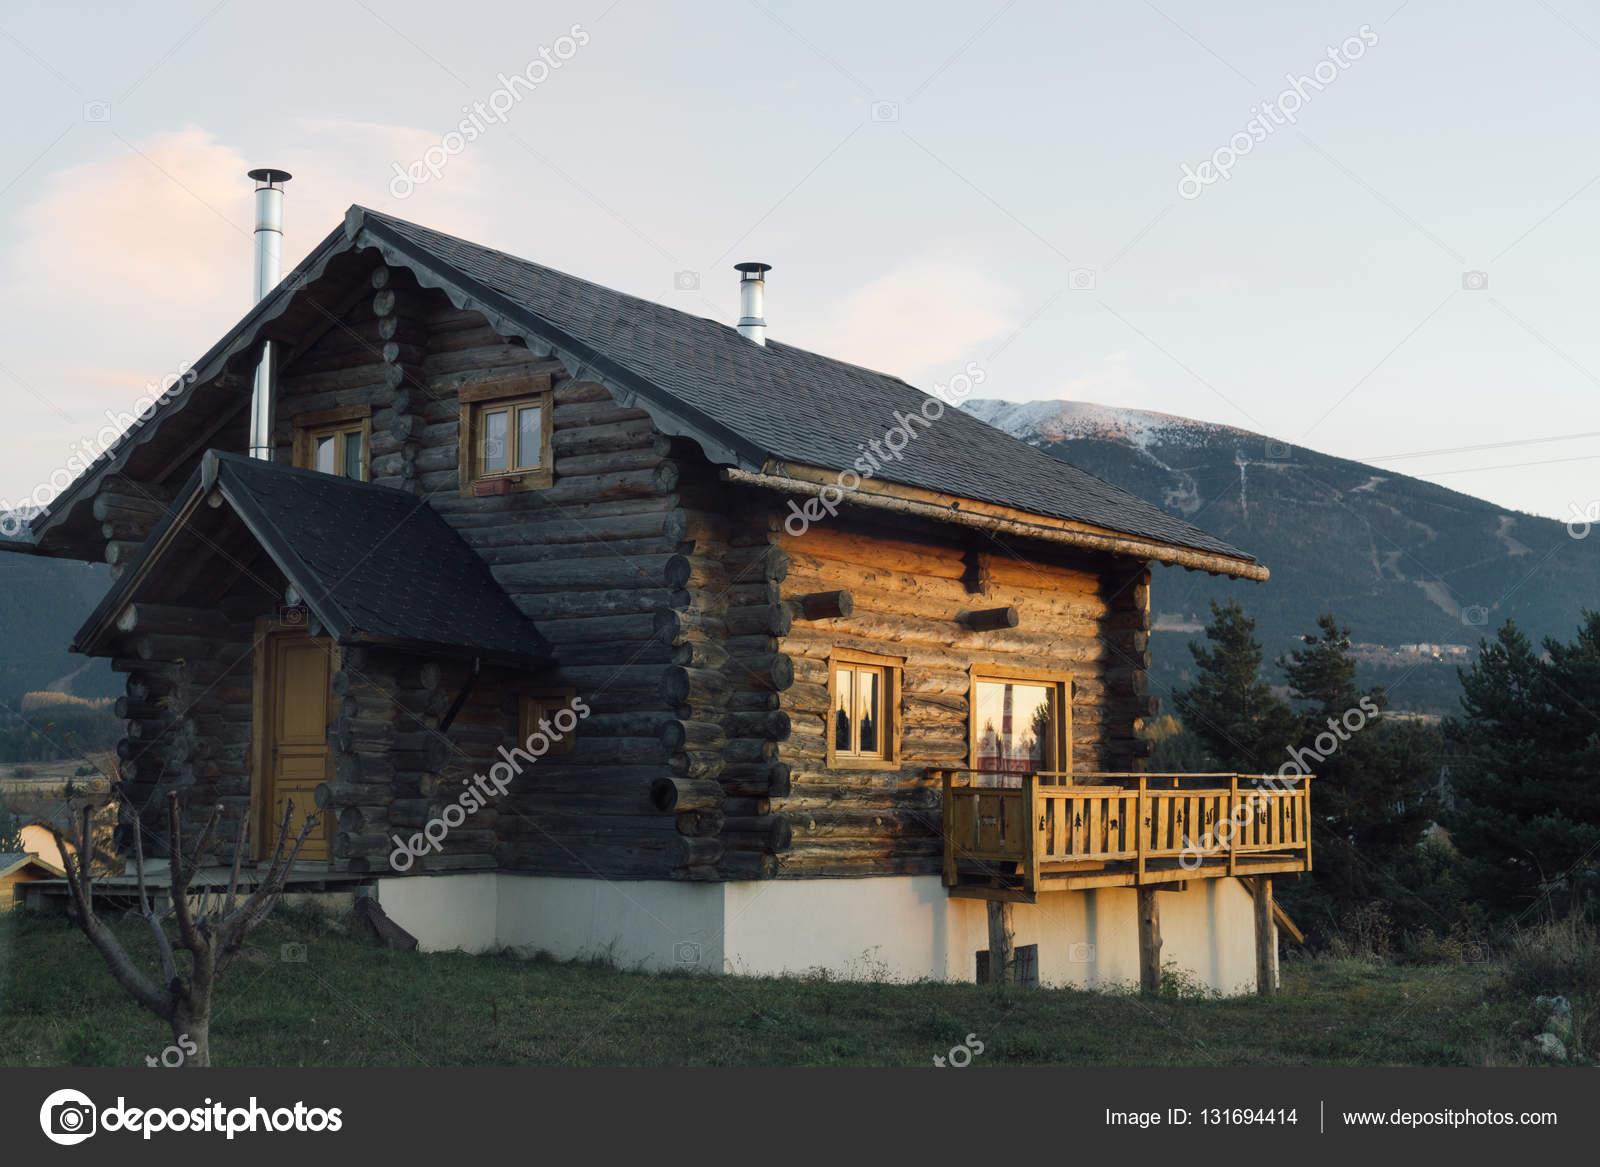 Extreem Klein huisje in de bergen — Stockfoto © skat_36 #131694414 &MF94